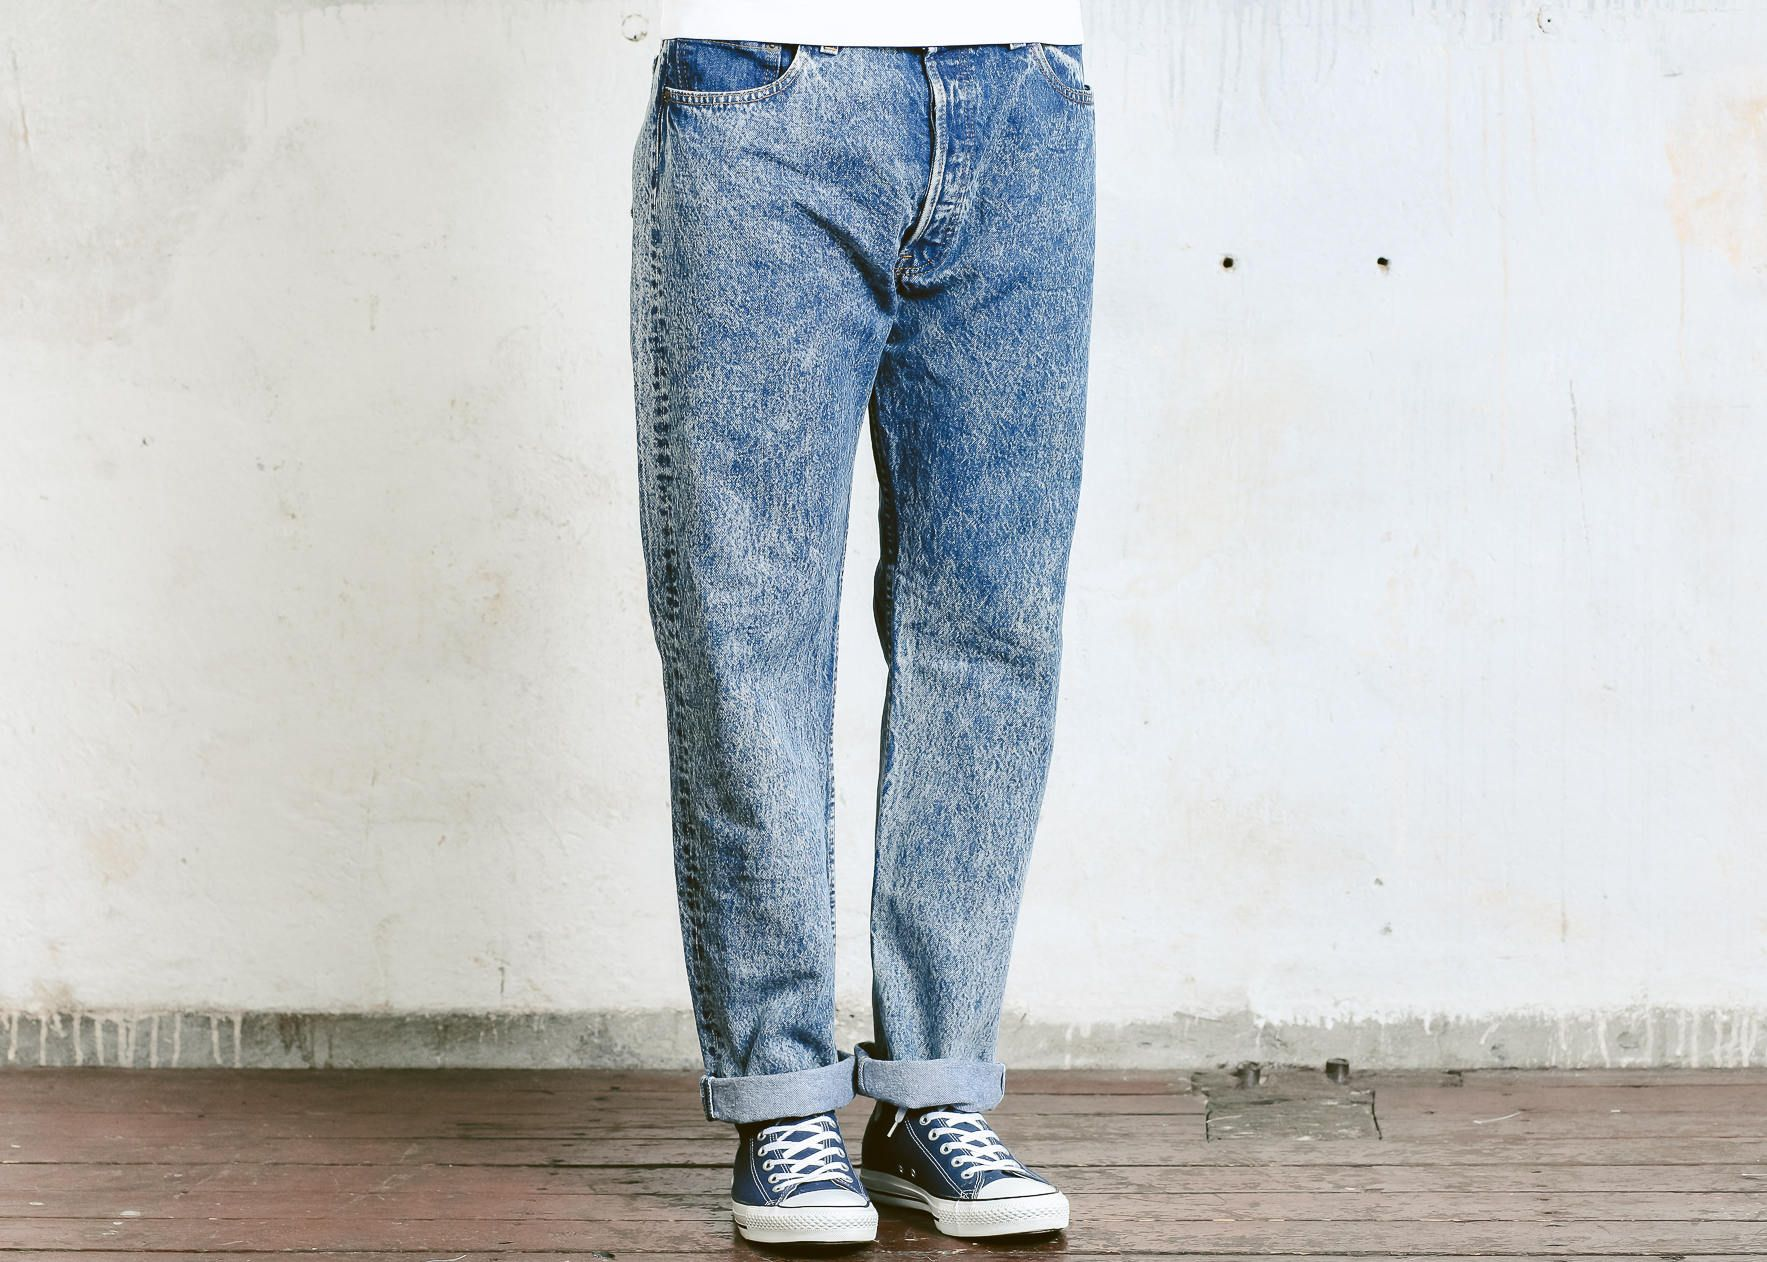 dae4c5f54d Acid Wash Levis Jeans . Vintage 90s Hipster Jeans Boyfriend Gift Tapered 90s  Jeans Men High Waist Jeans Unisex Denim Jeans . size W36 L30